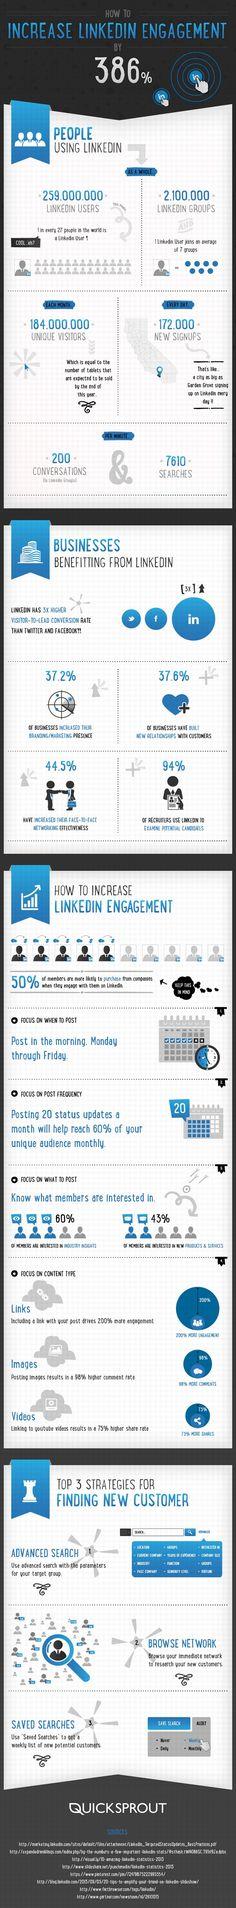 How to Increase Your #LinkedIn Engagement by 386% #infographic #smm #socialmediamarketing #socialmedia #marketing